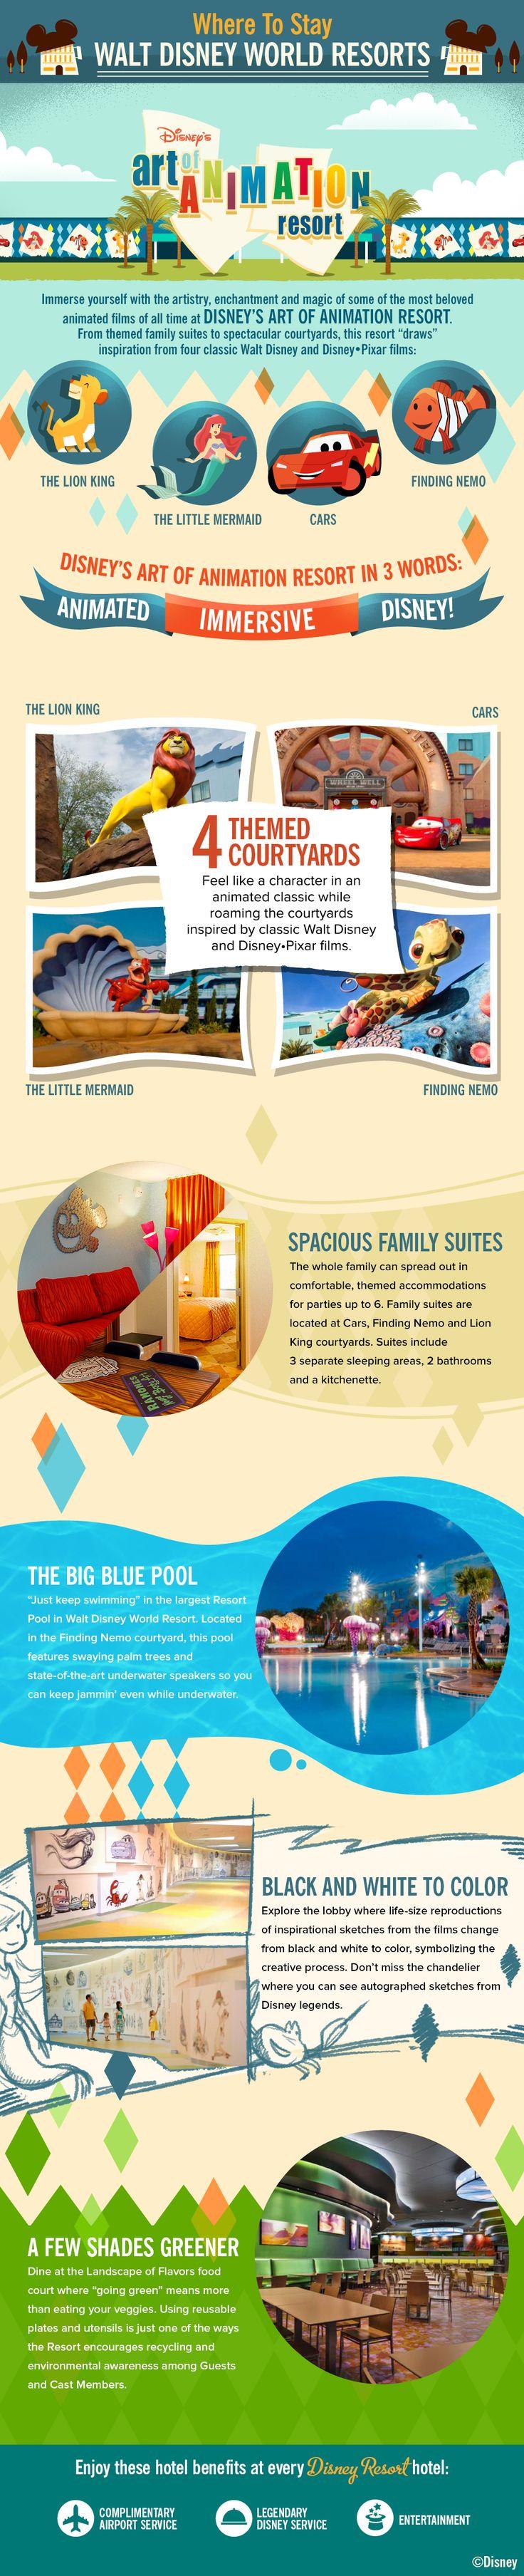 Disney's Art of Animation Resort | Infographic #WaltDisneyWorld